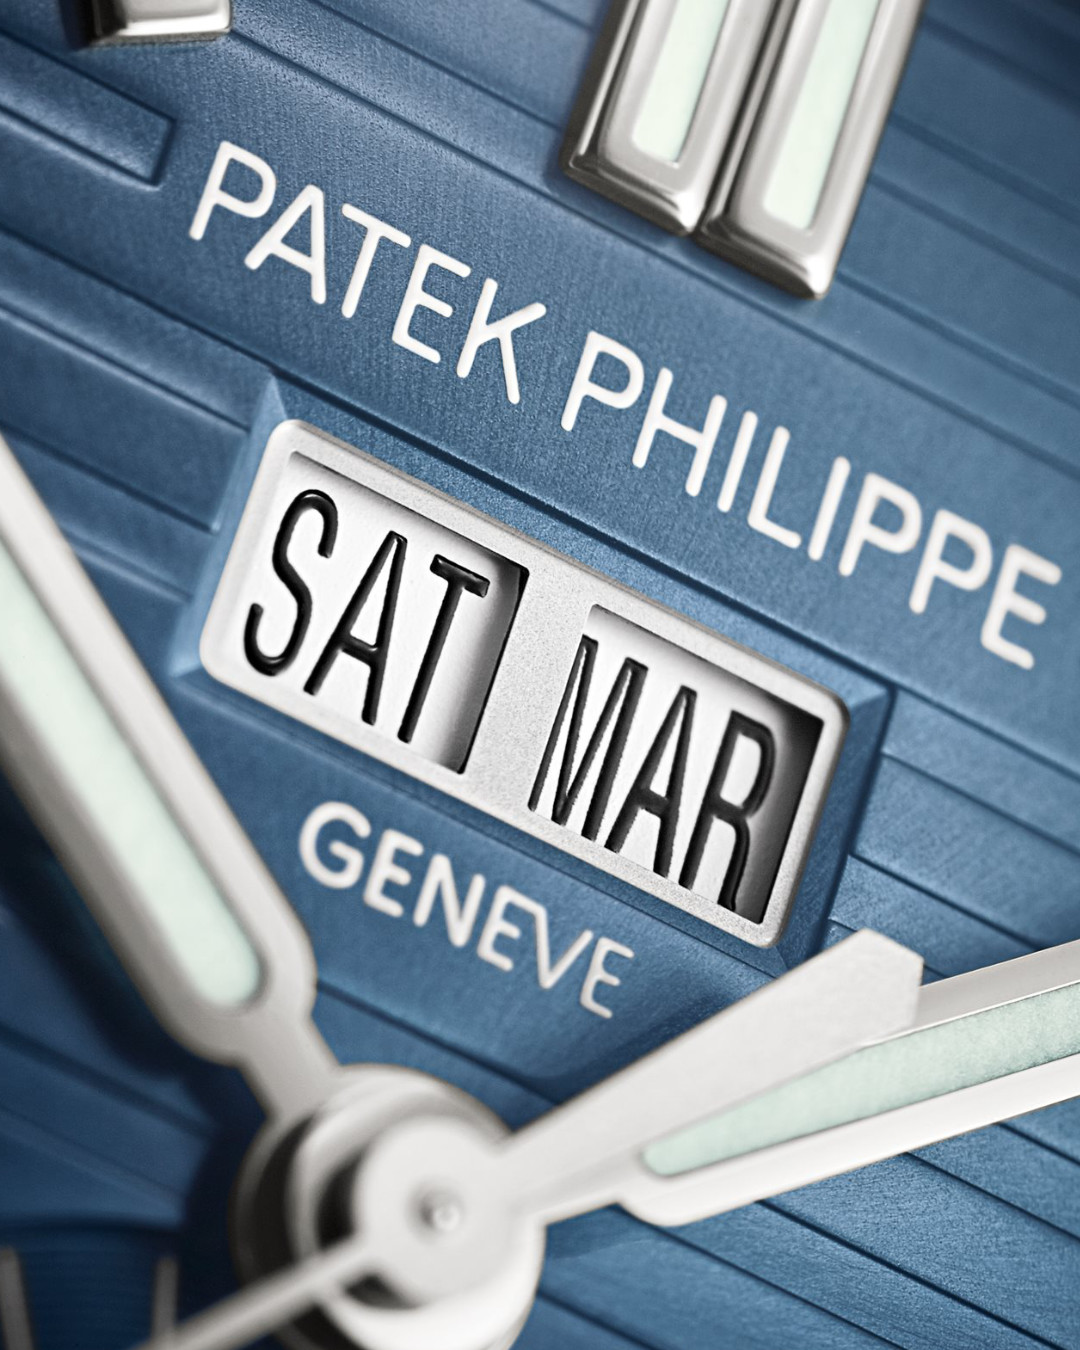 The Patek Philippe Nautilus - The Hour Glass - Malaysia